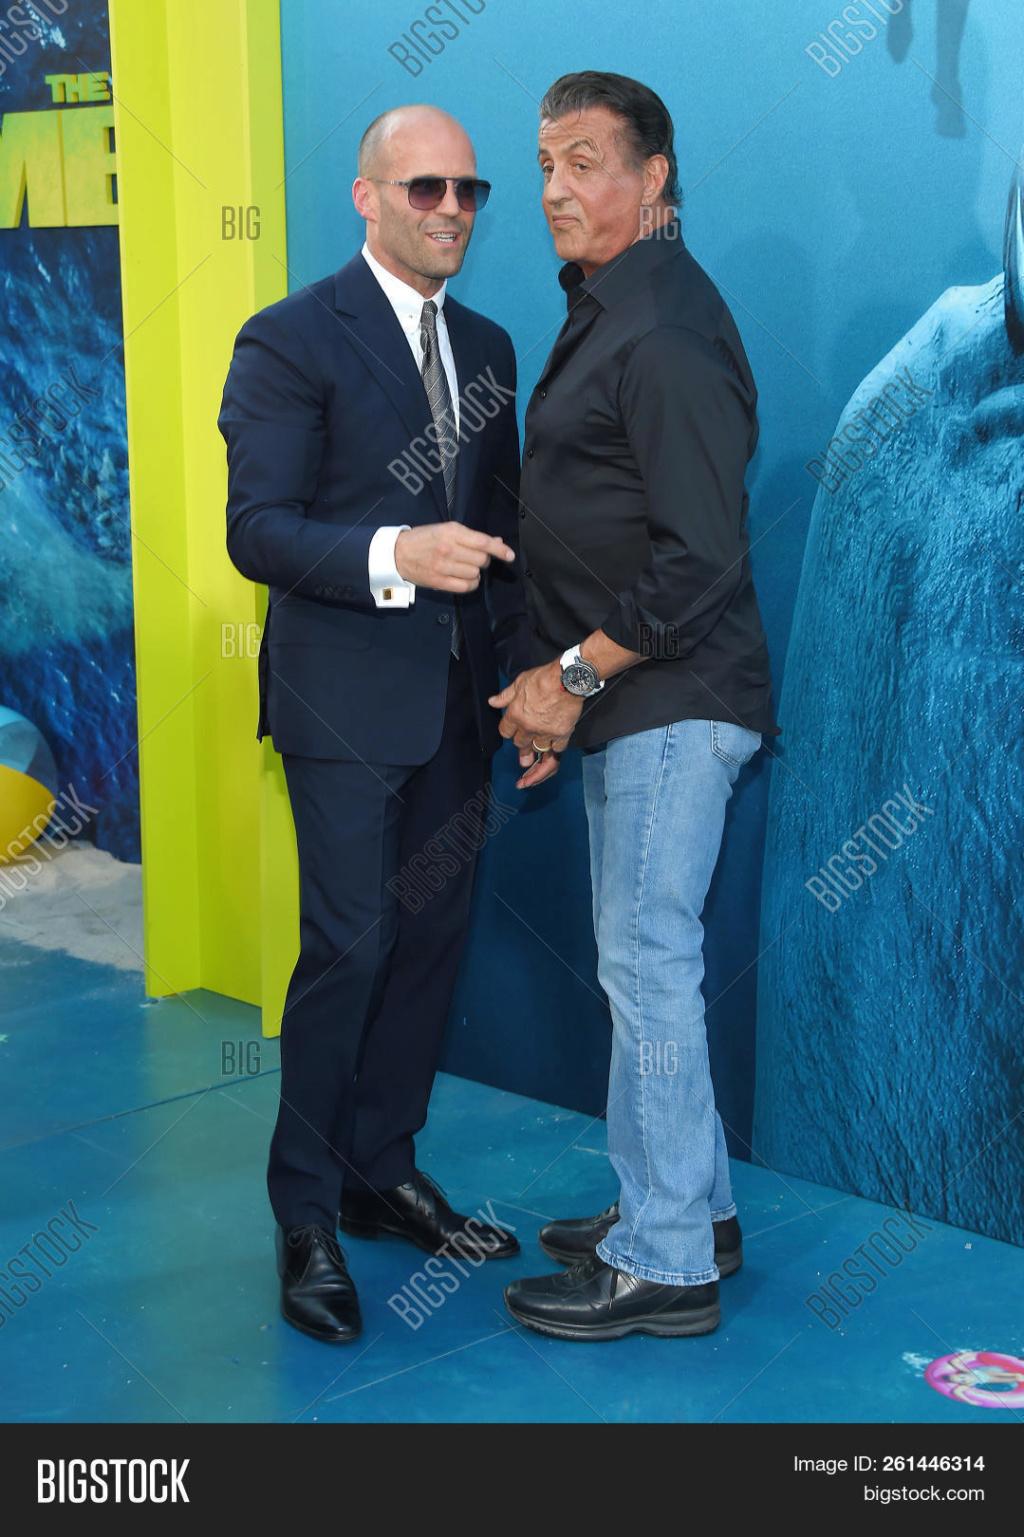 ¿Cuánto mide Jason Statham? - Altura - Real height - Página 2 26144610